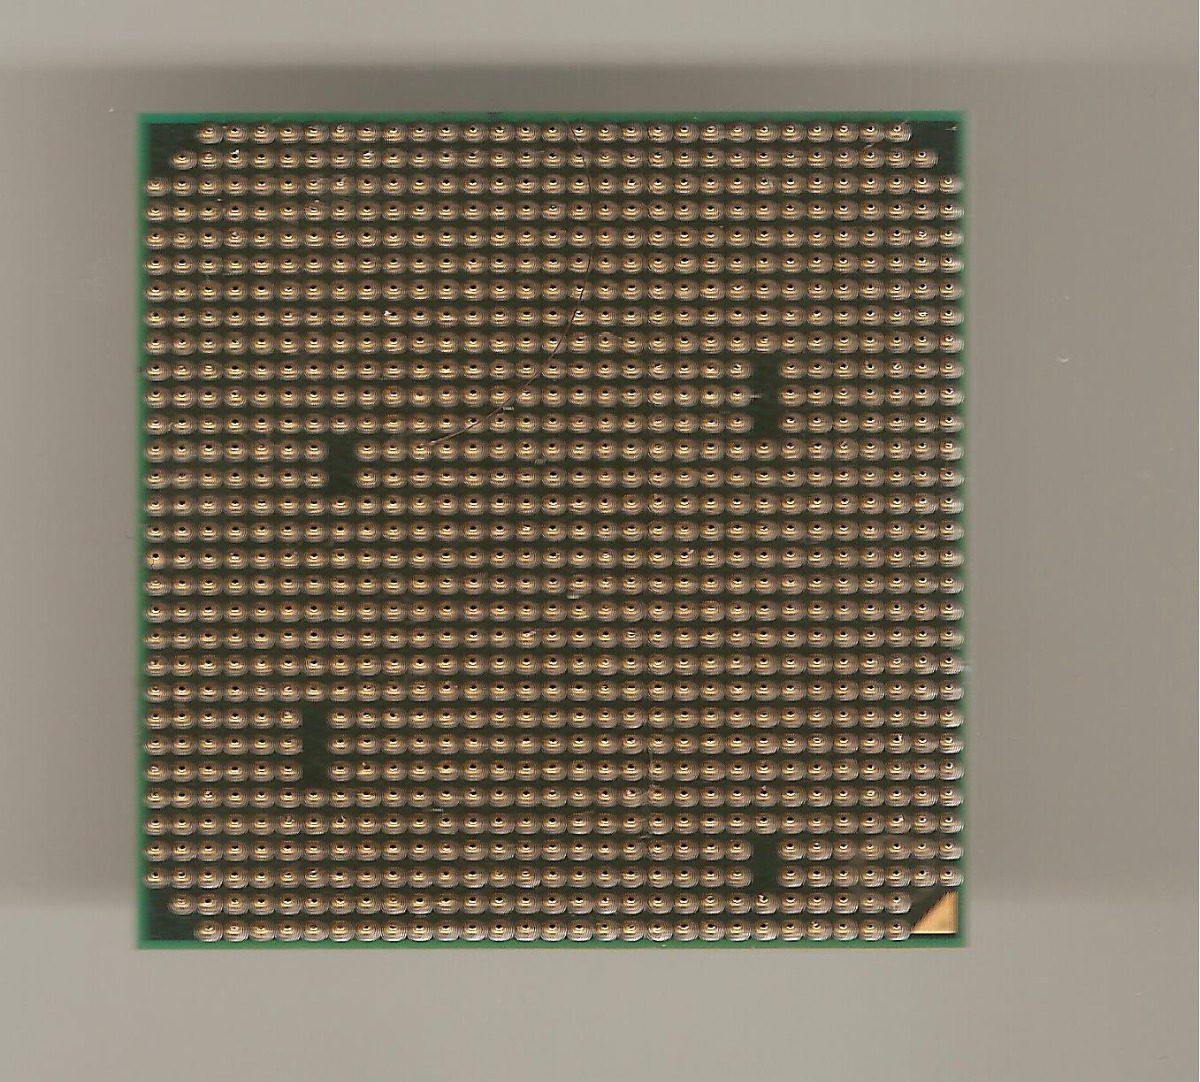 Amd Athlon Ii X3 425 27ghz Tri Core Socket Am3 Unlock 37900 En Cargando Zoom